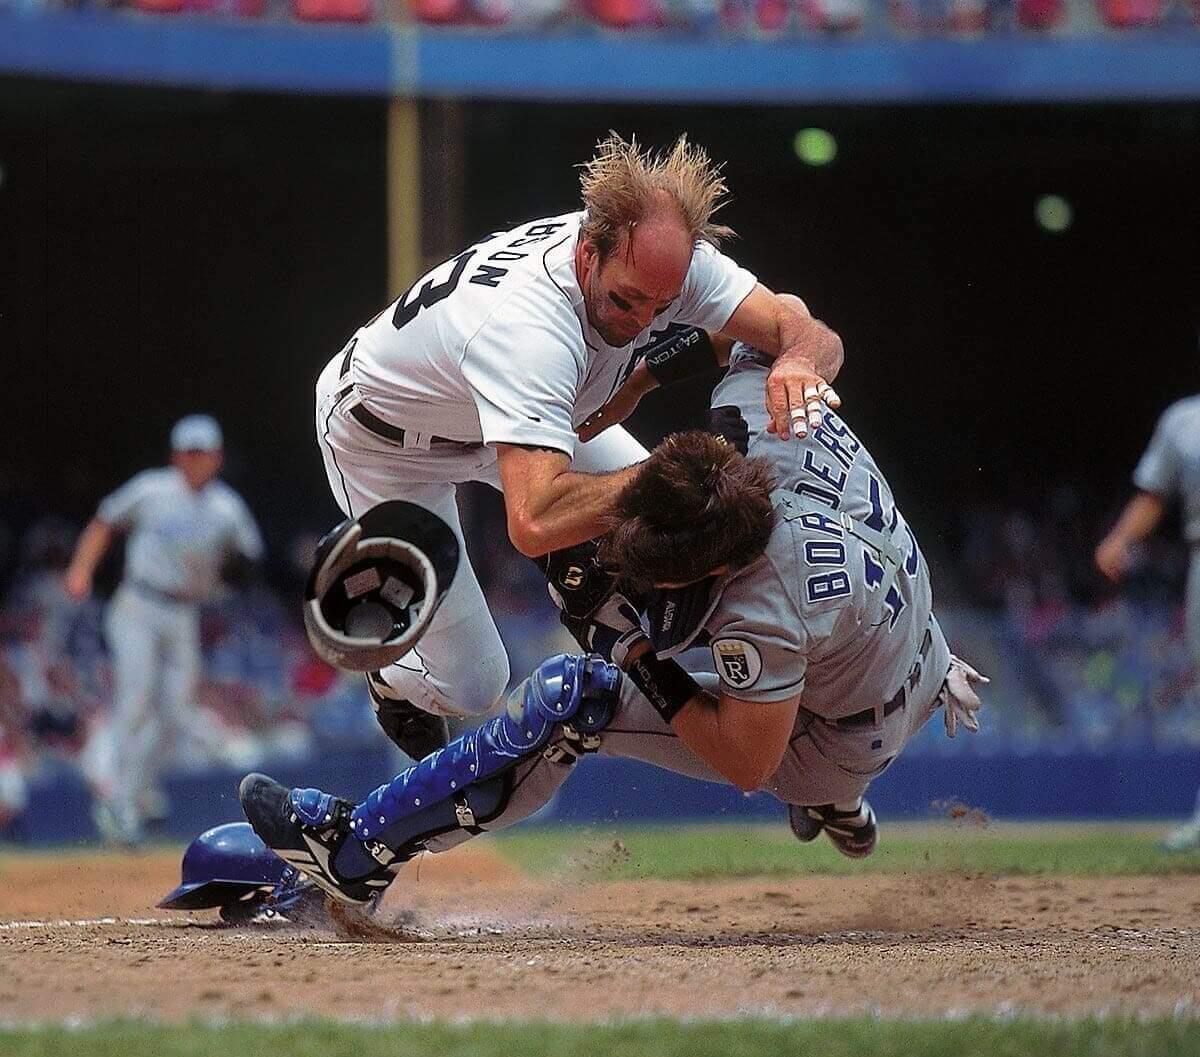 Great Sports Images - Kirk Gibson Barrels Into Catcher Pat Borders - Chuck Solomon